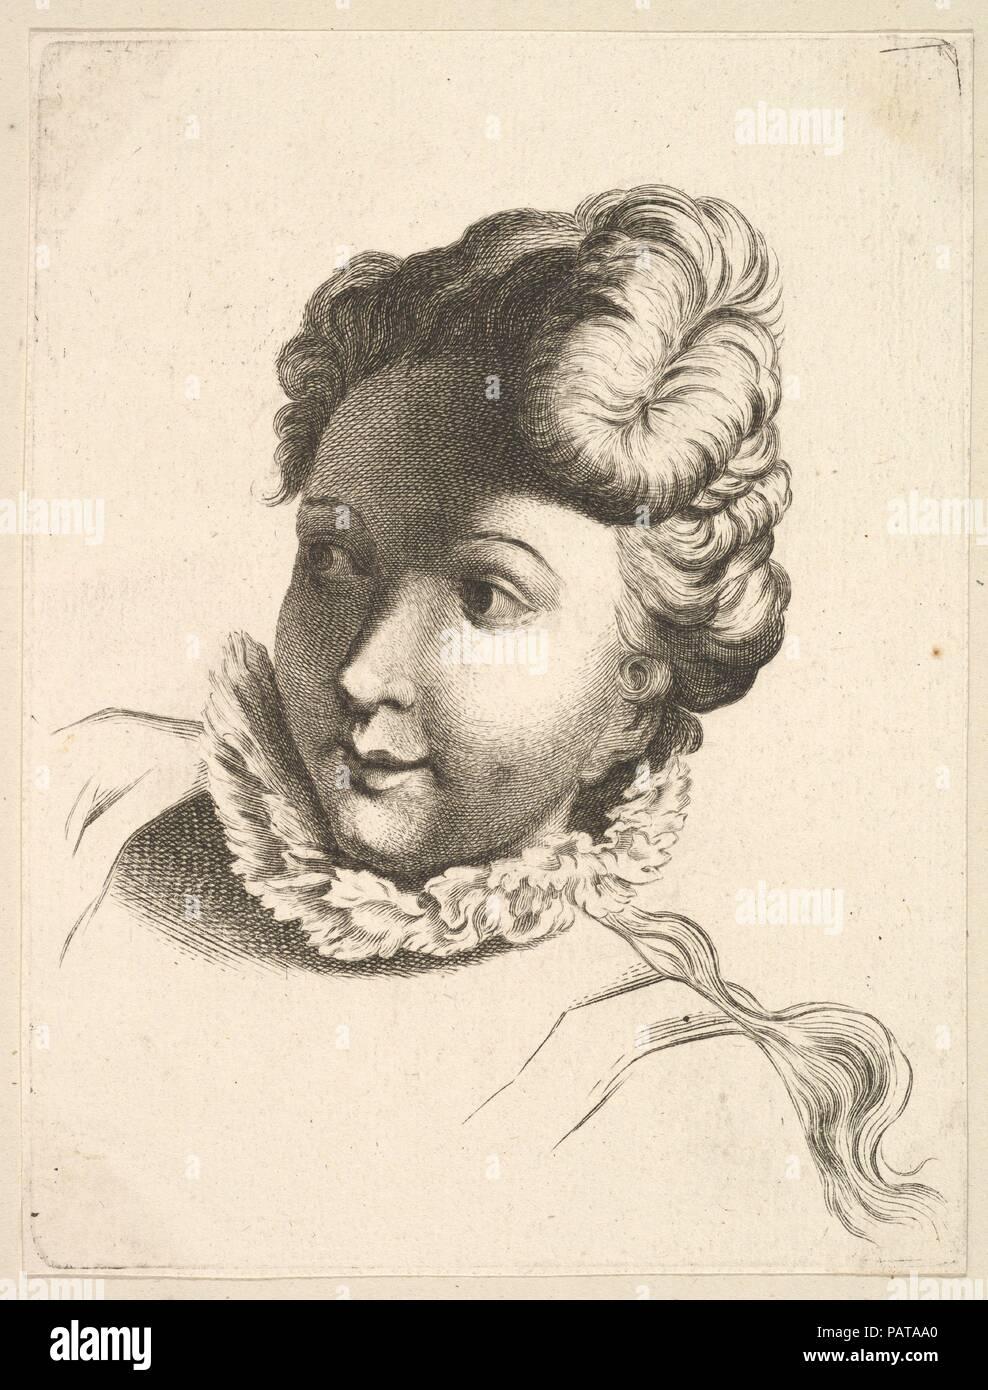 Head Of A Woman Wearing A Ruff From Livre De Tetes Gravees